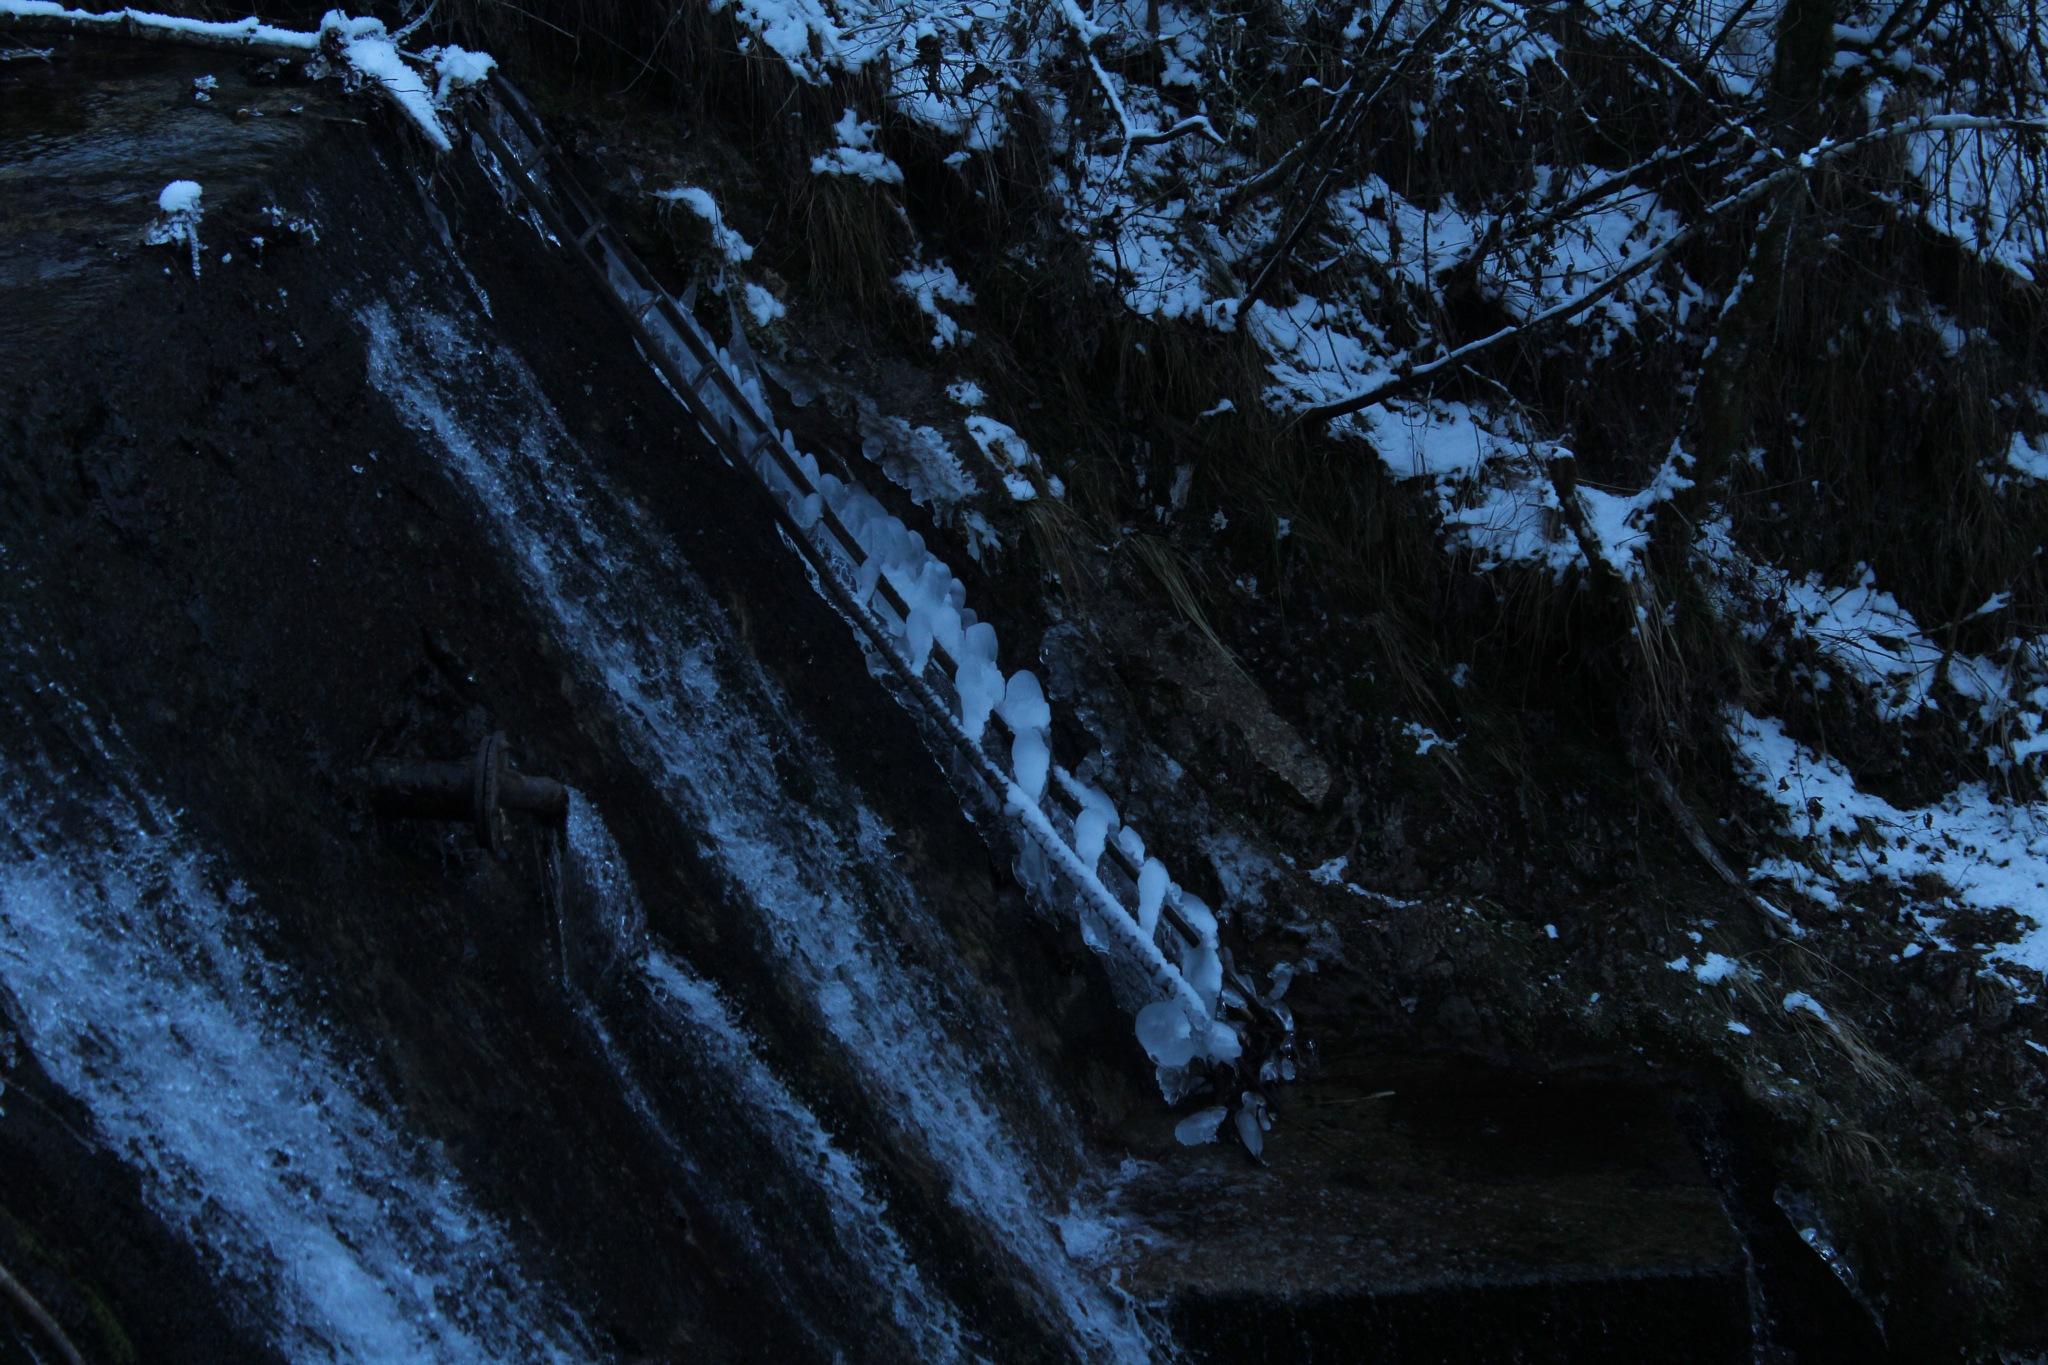 Frozen... Val Vertova BG by saraorler